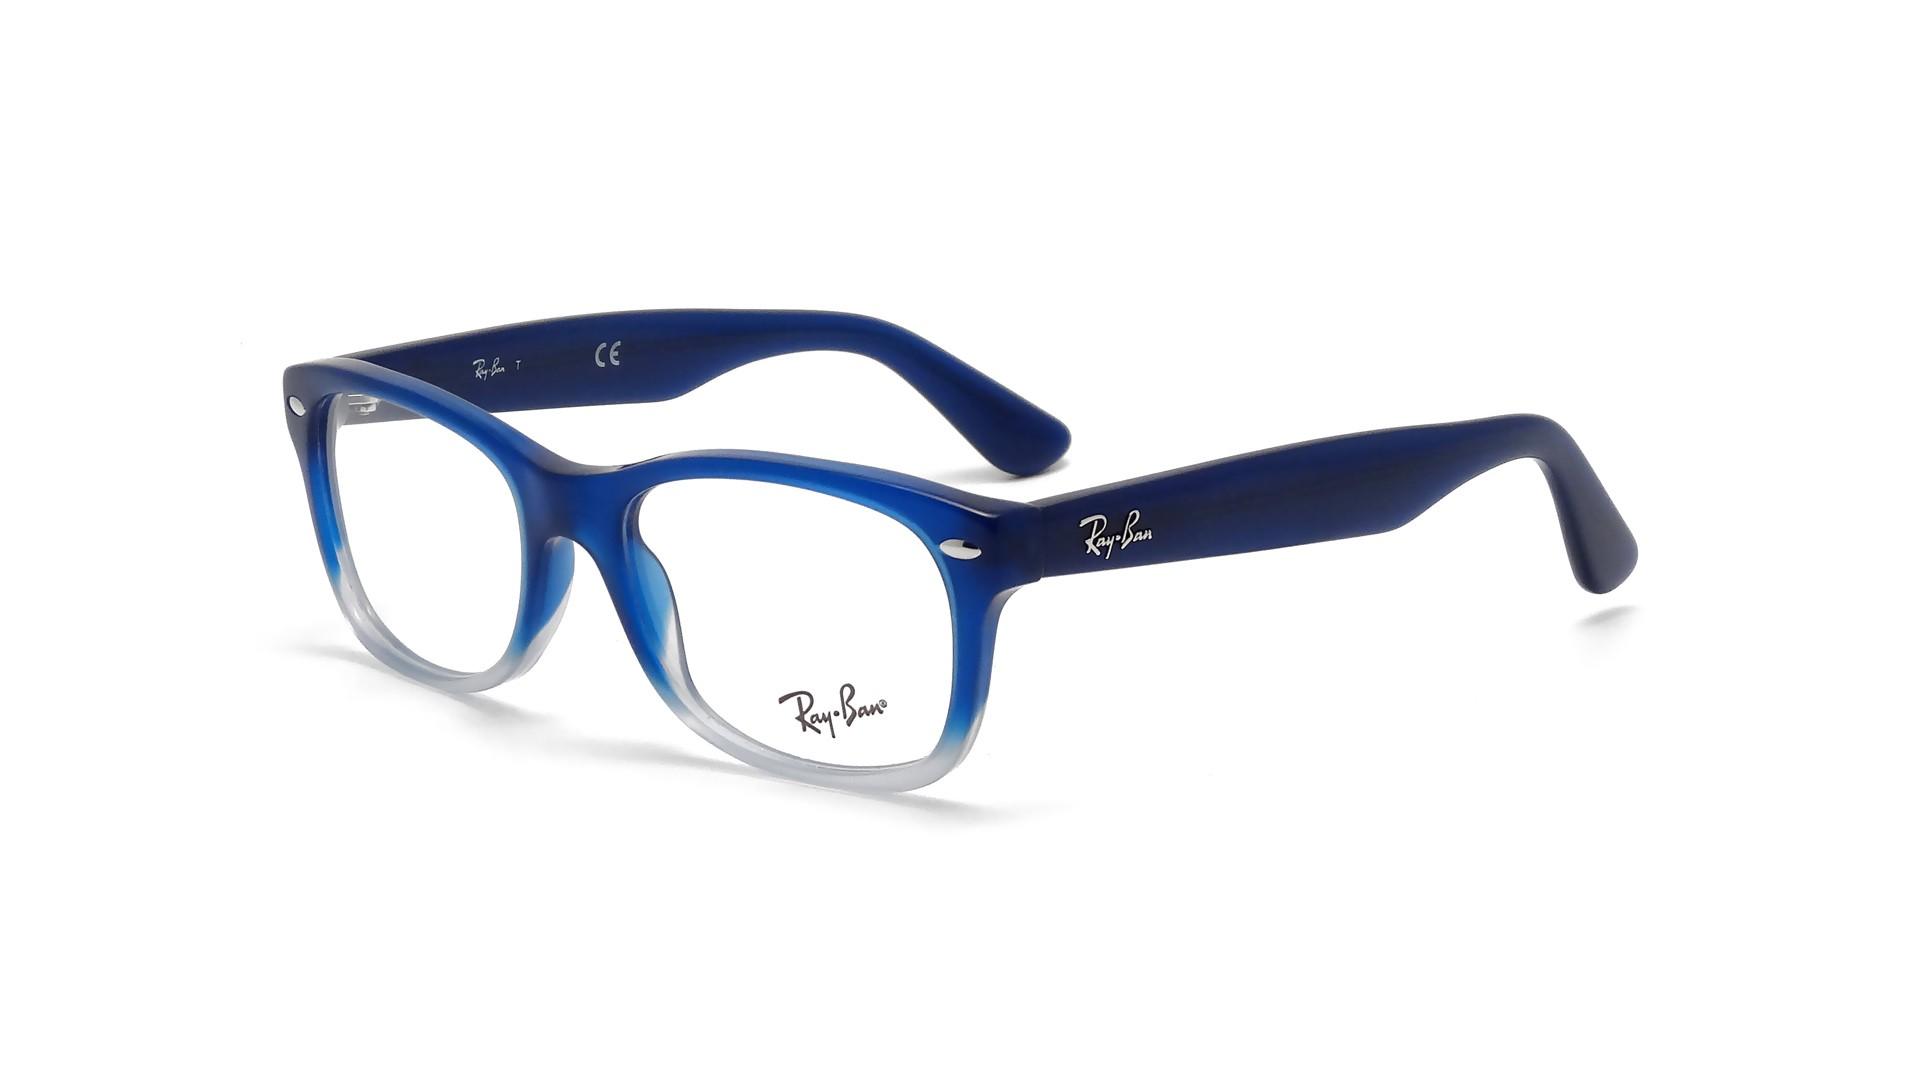 a1124d5decc Eyeglasses Ray-Ban RY1528 RB1528 3581 48-16 Blue Junior